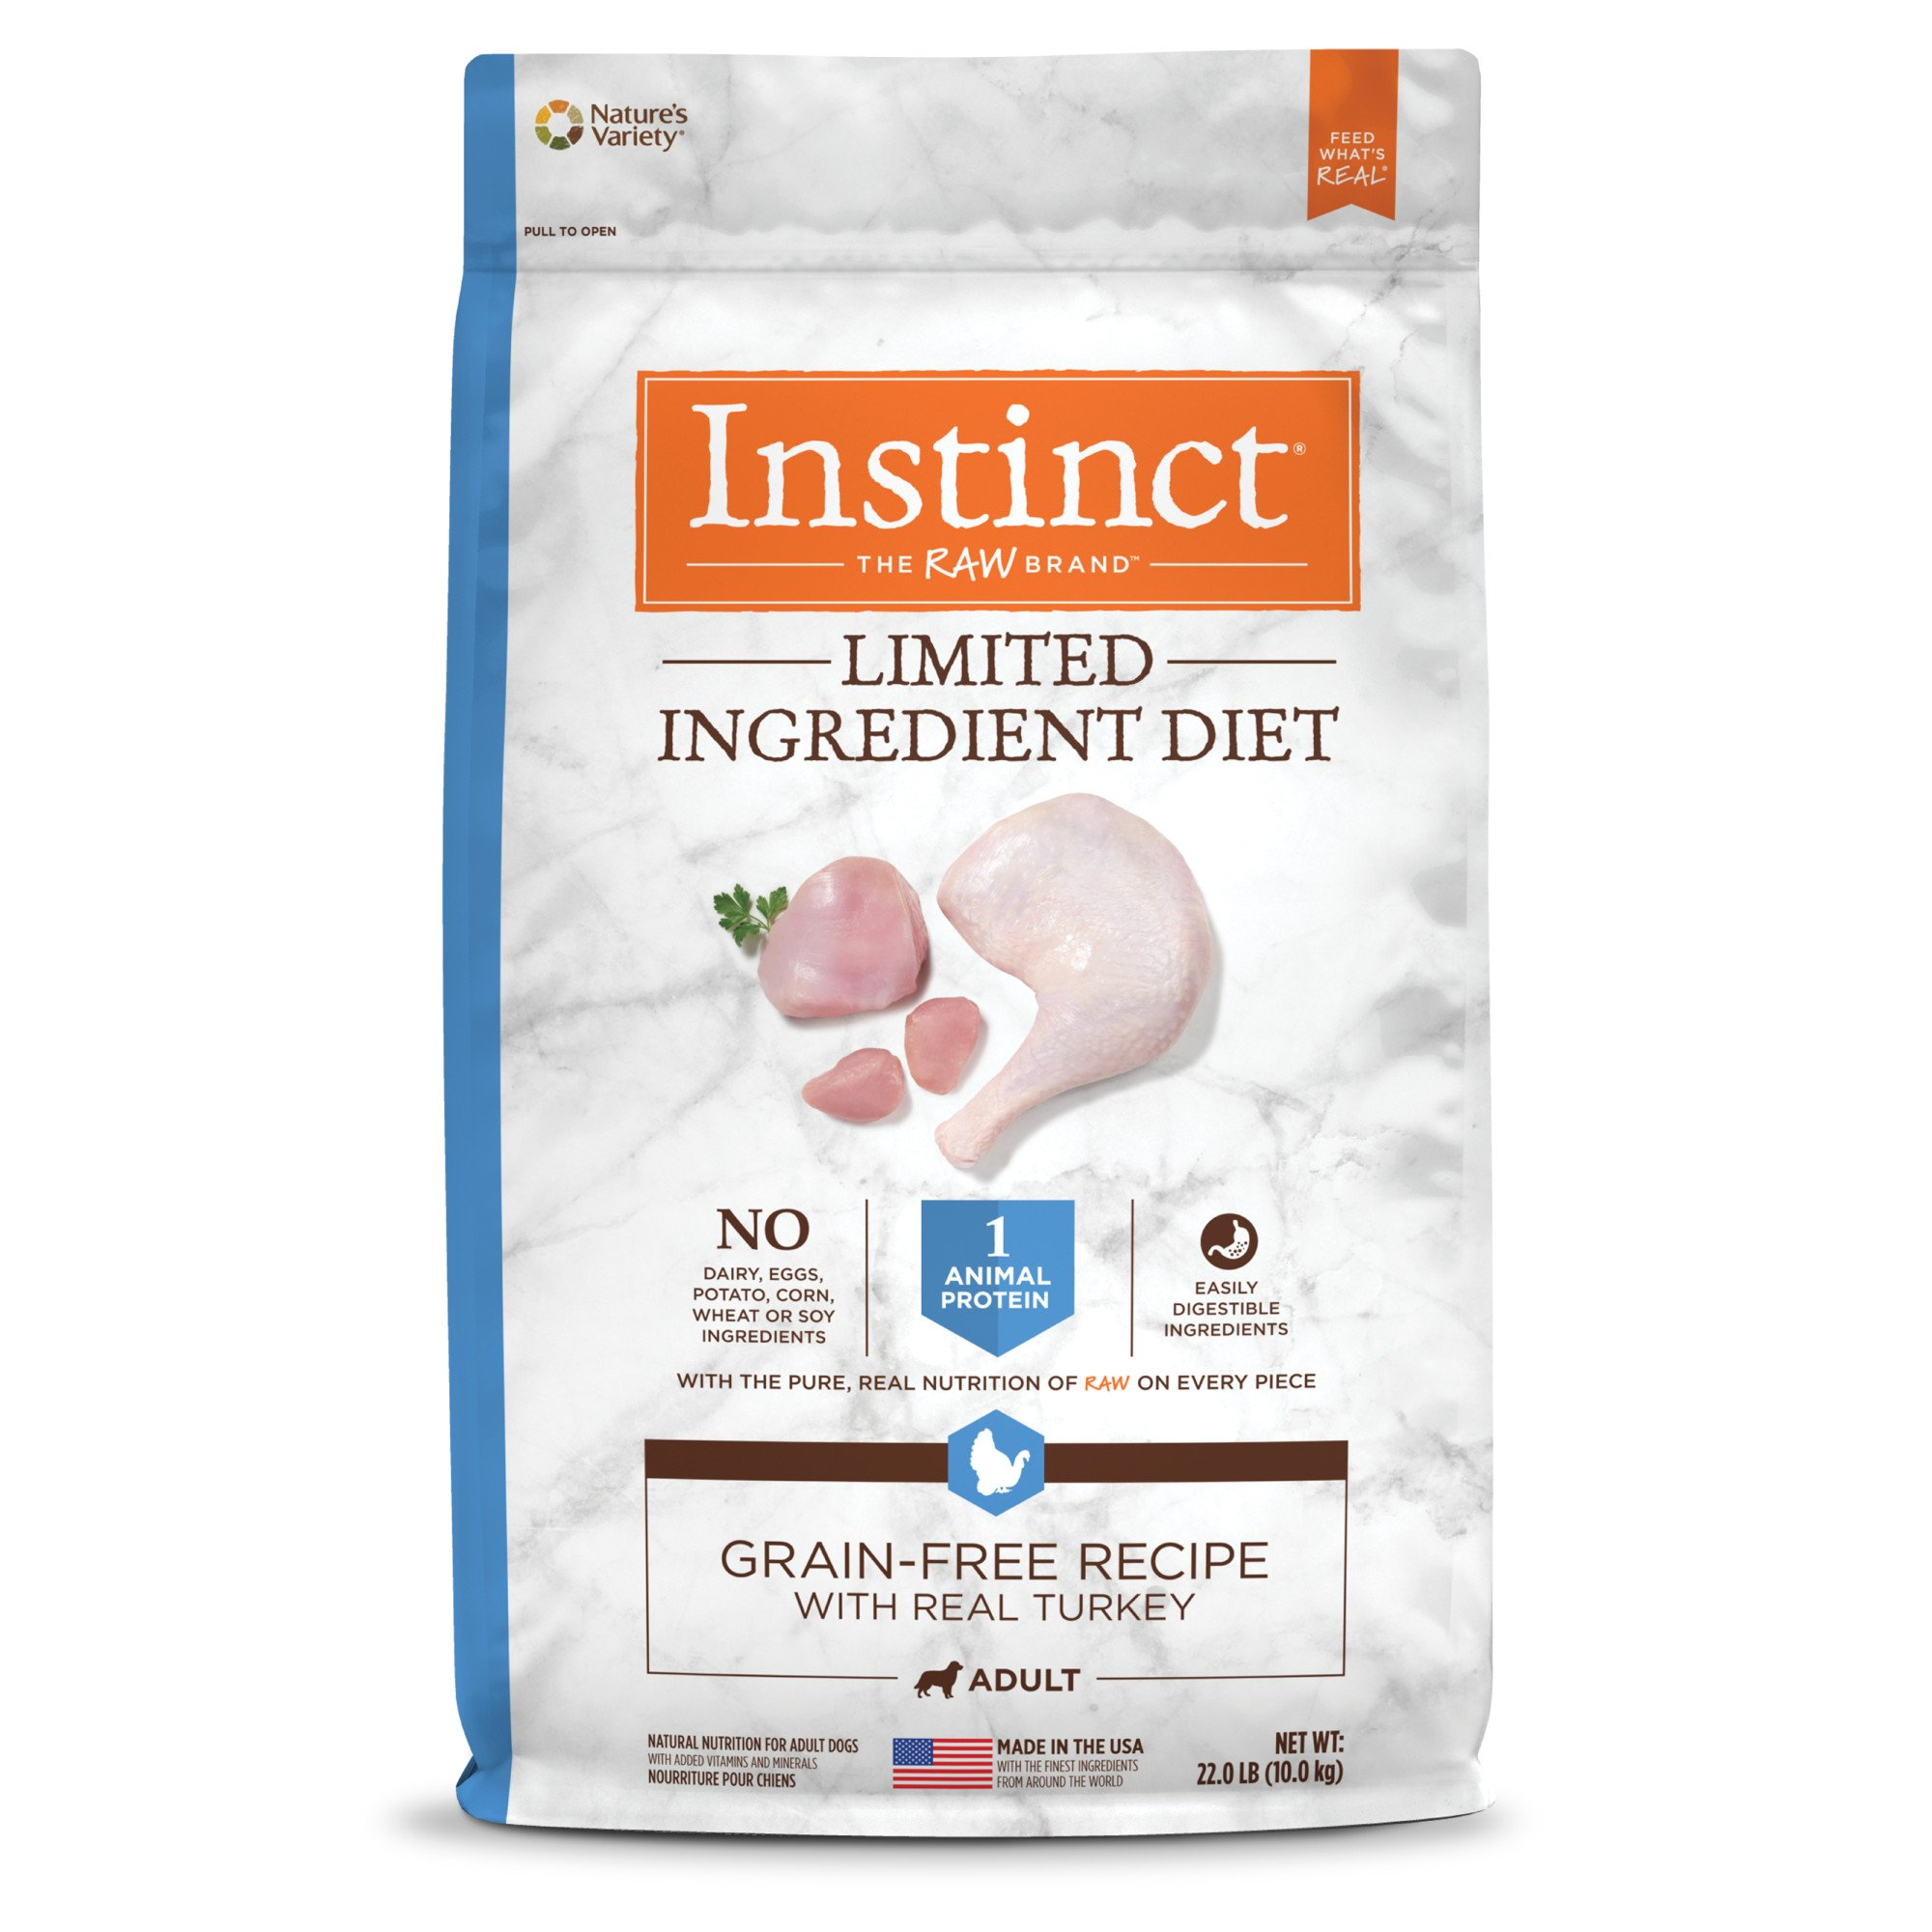 Nature's Variety Instinct Grain-Free Limited Ingredient Diet Turkey Meal Dog Food